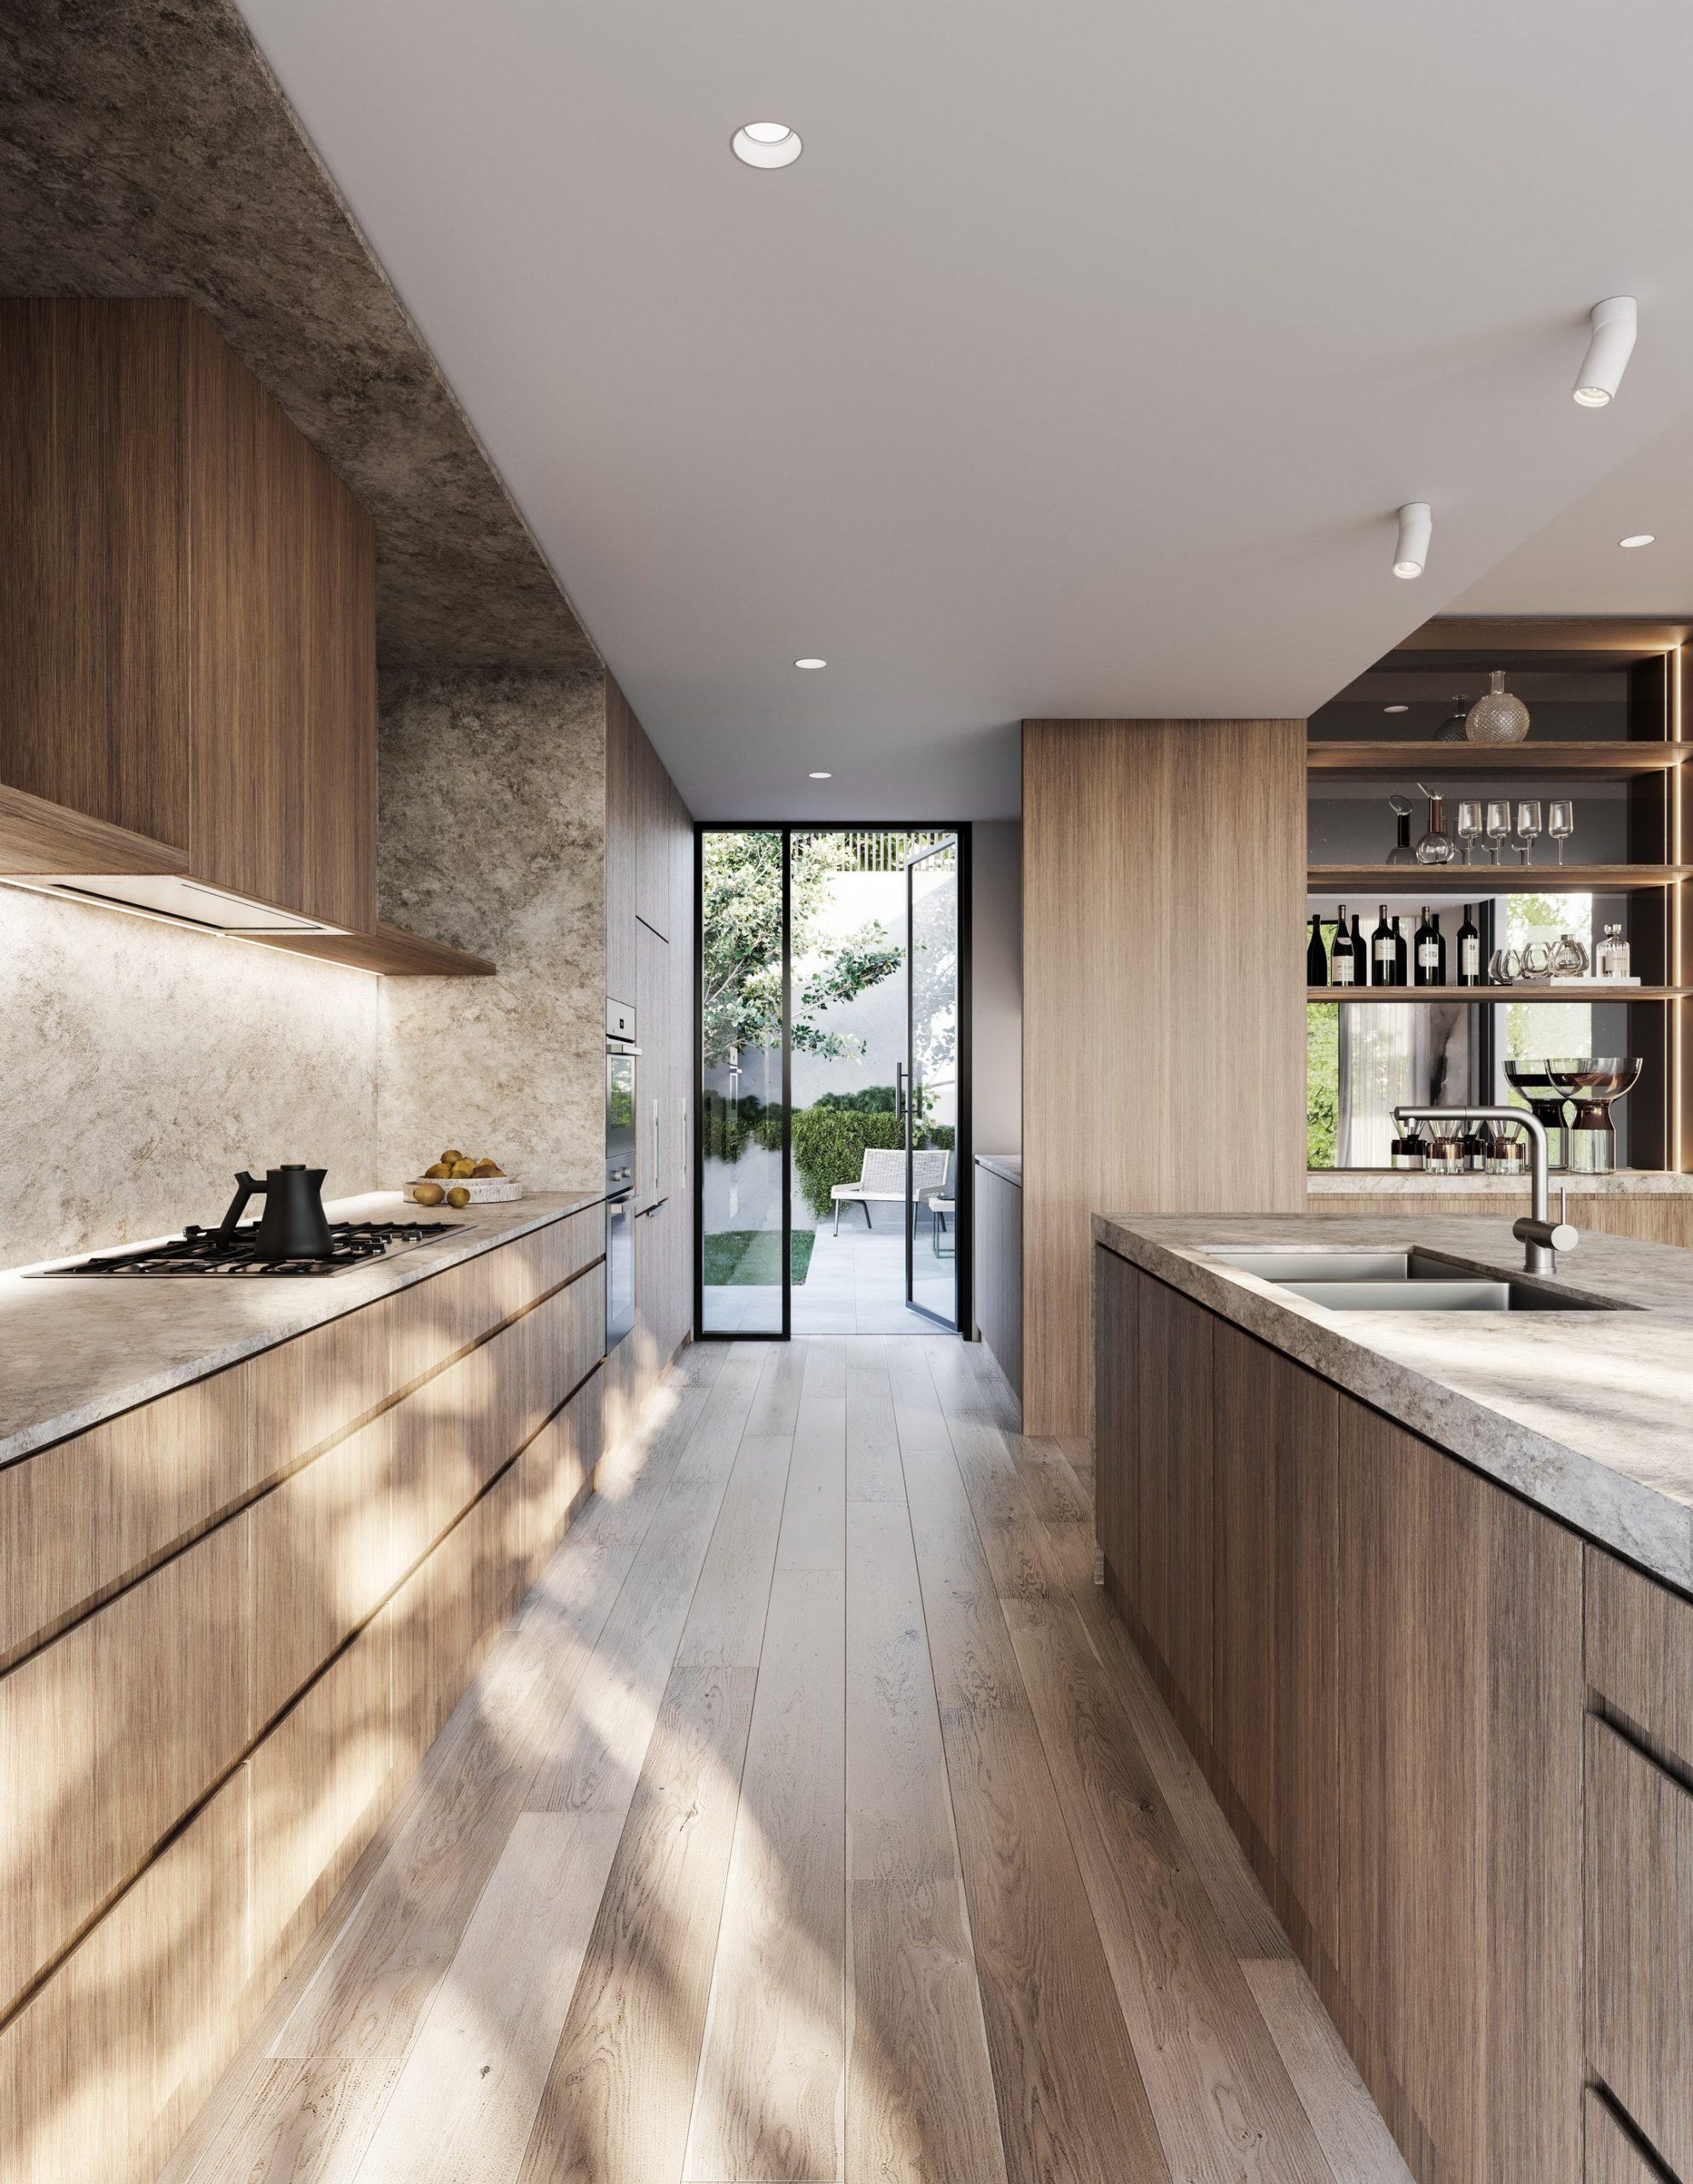 fkd-studio-3d-archiecture-visualisation-cgi-archviz-eaglemont-interior-kitchen